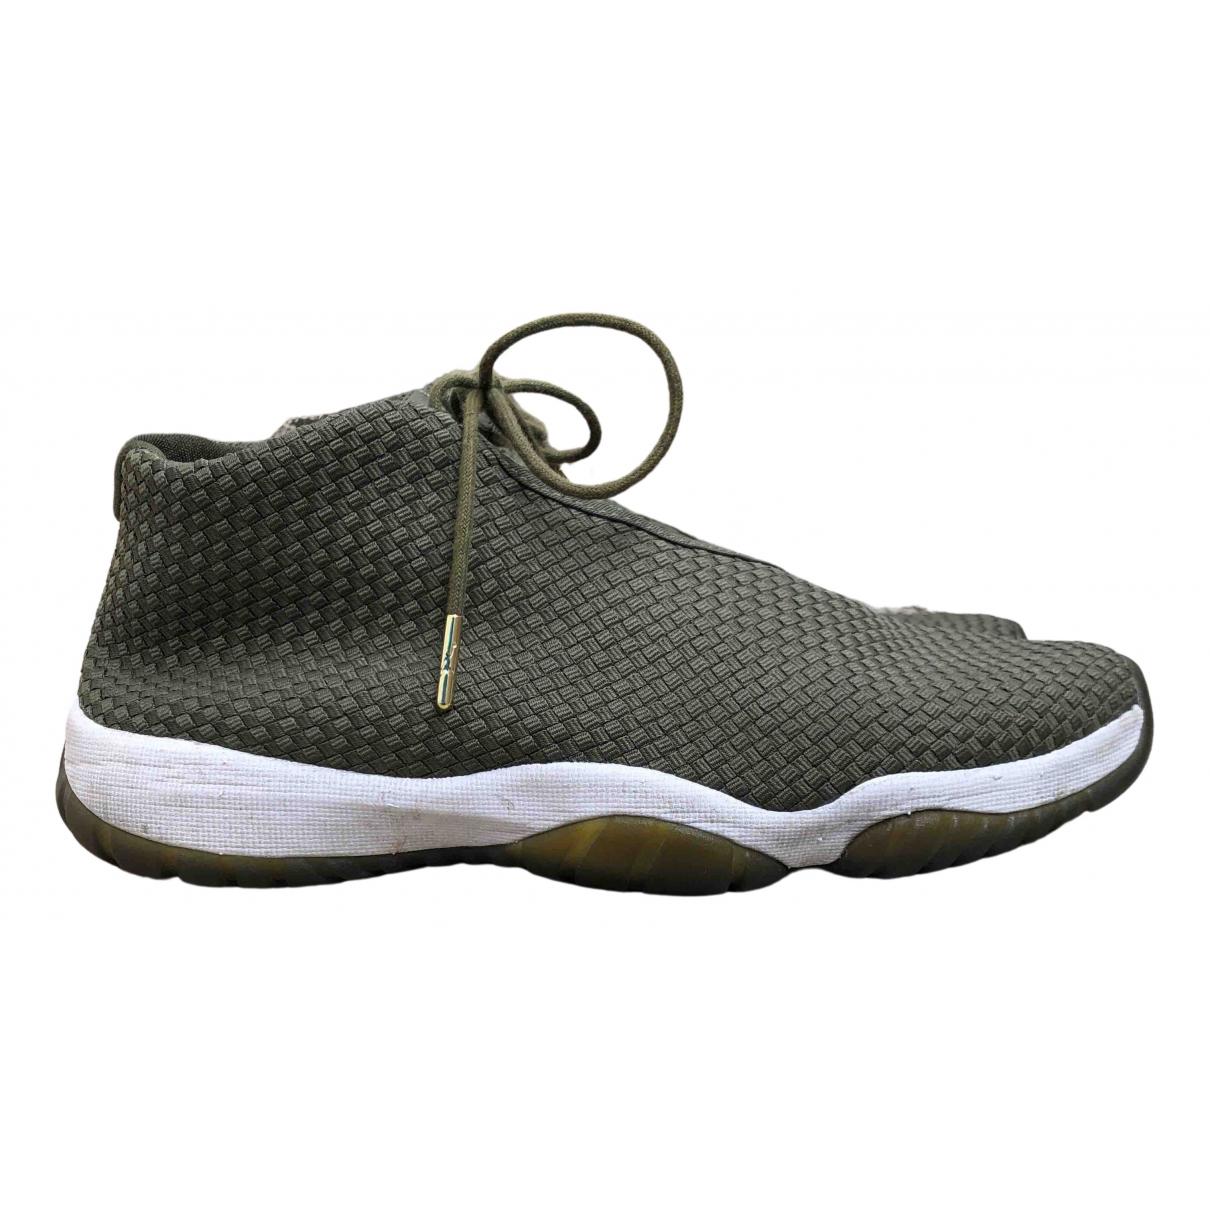 Jordan - Baskets Air Jordan Future pour homme - kaki